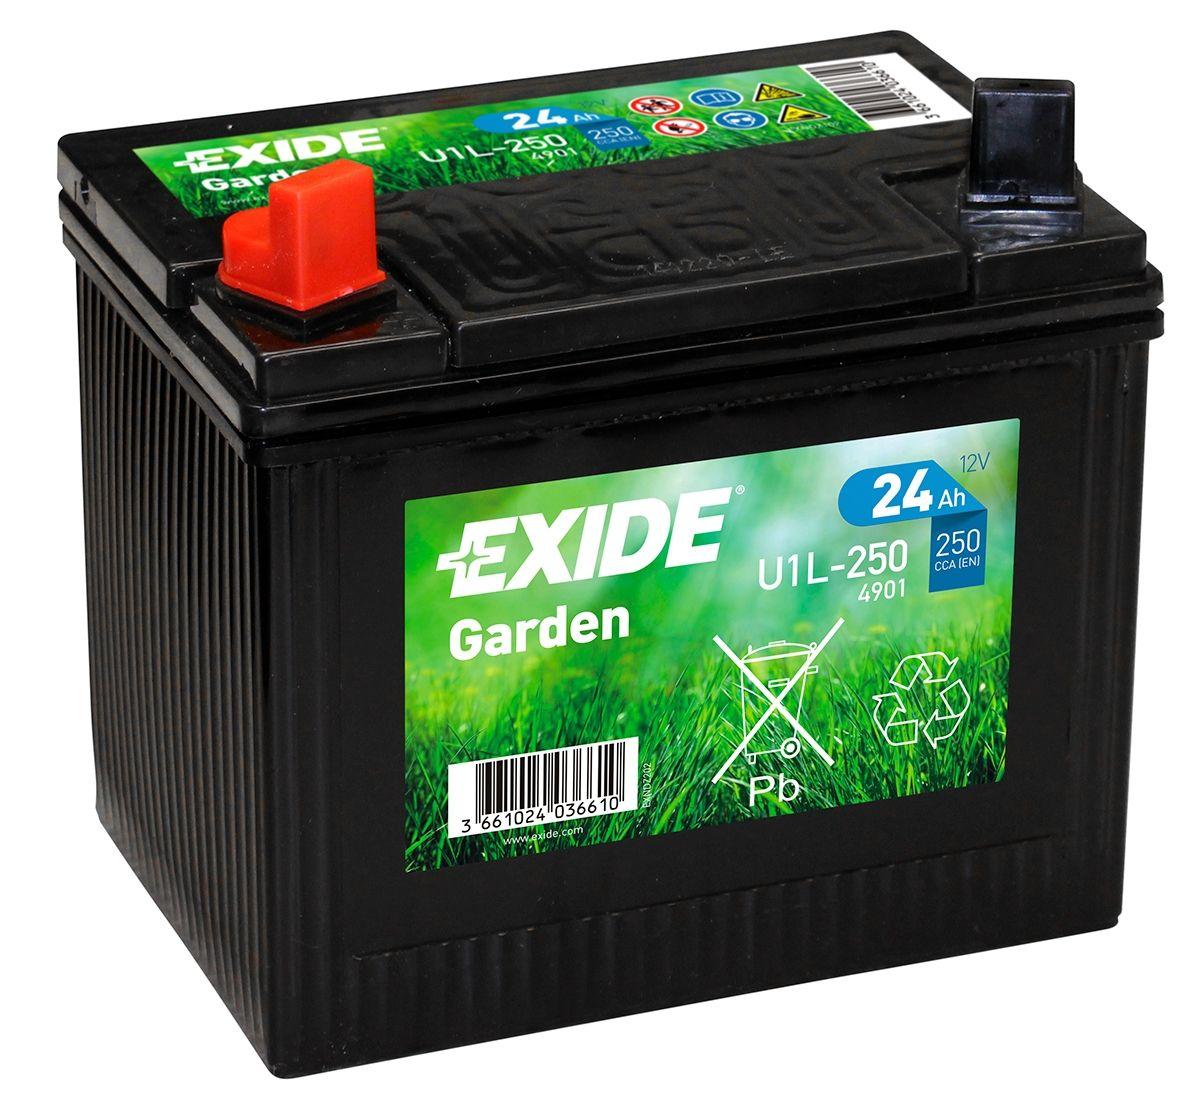 51913 Lawnstar Lawnmower Battery 12V